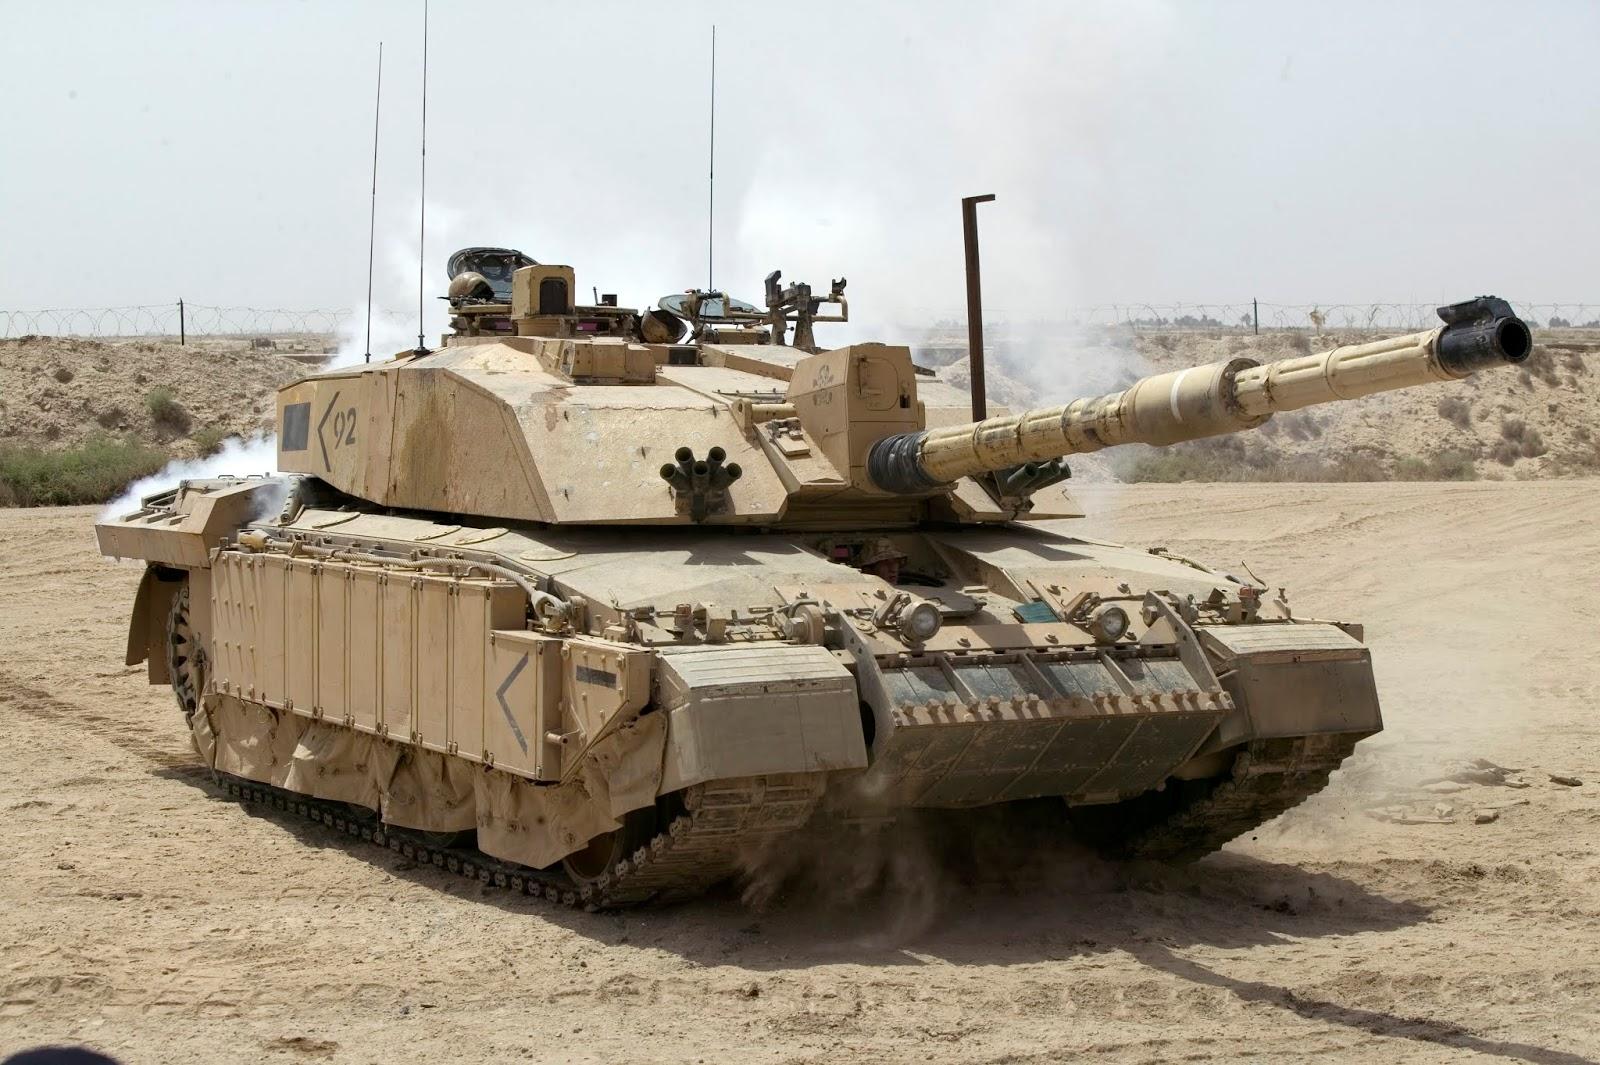 Challenger_2_Main_Battle_Tank_patrolling_outside_Basra%252C_Iraq_MOD_45148325.jpg